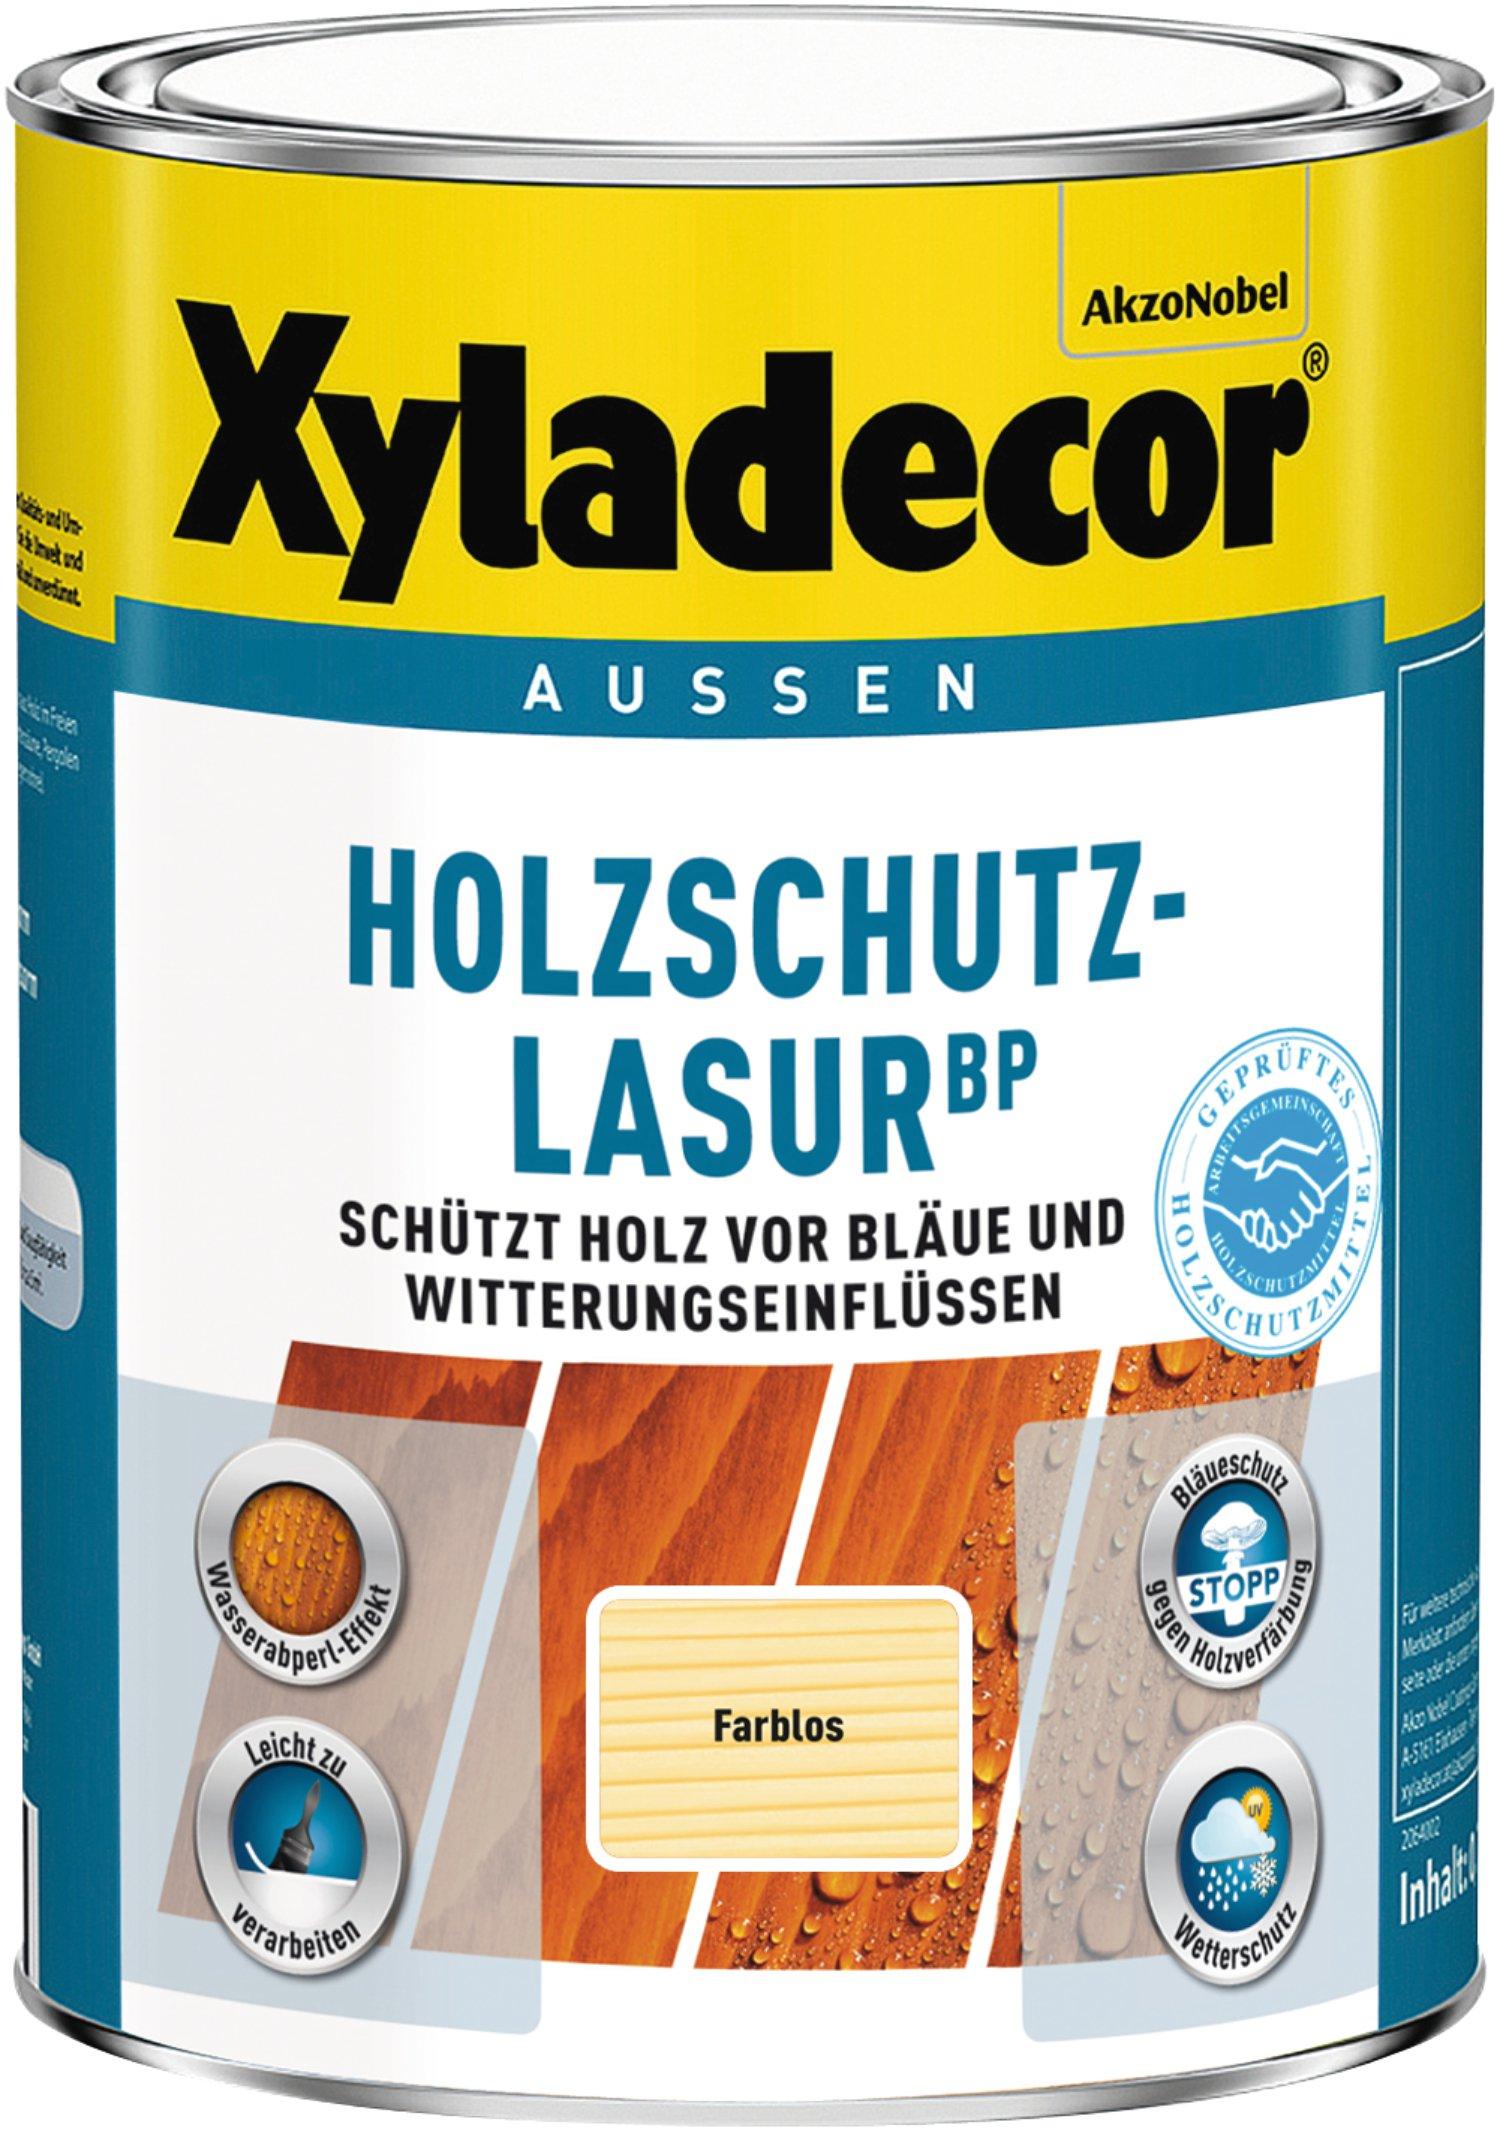 xyladecor holzschutz-lasur bp farblos 1 l   lagerhaus